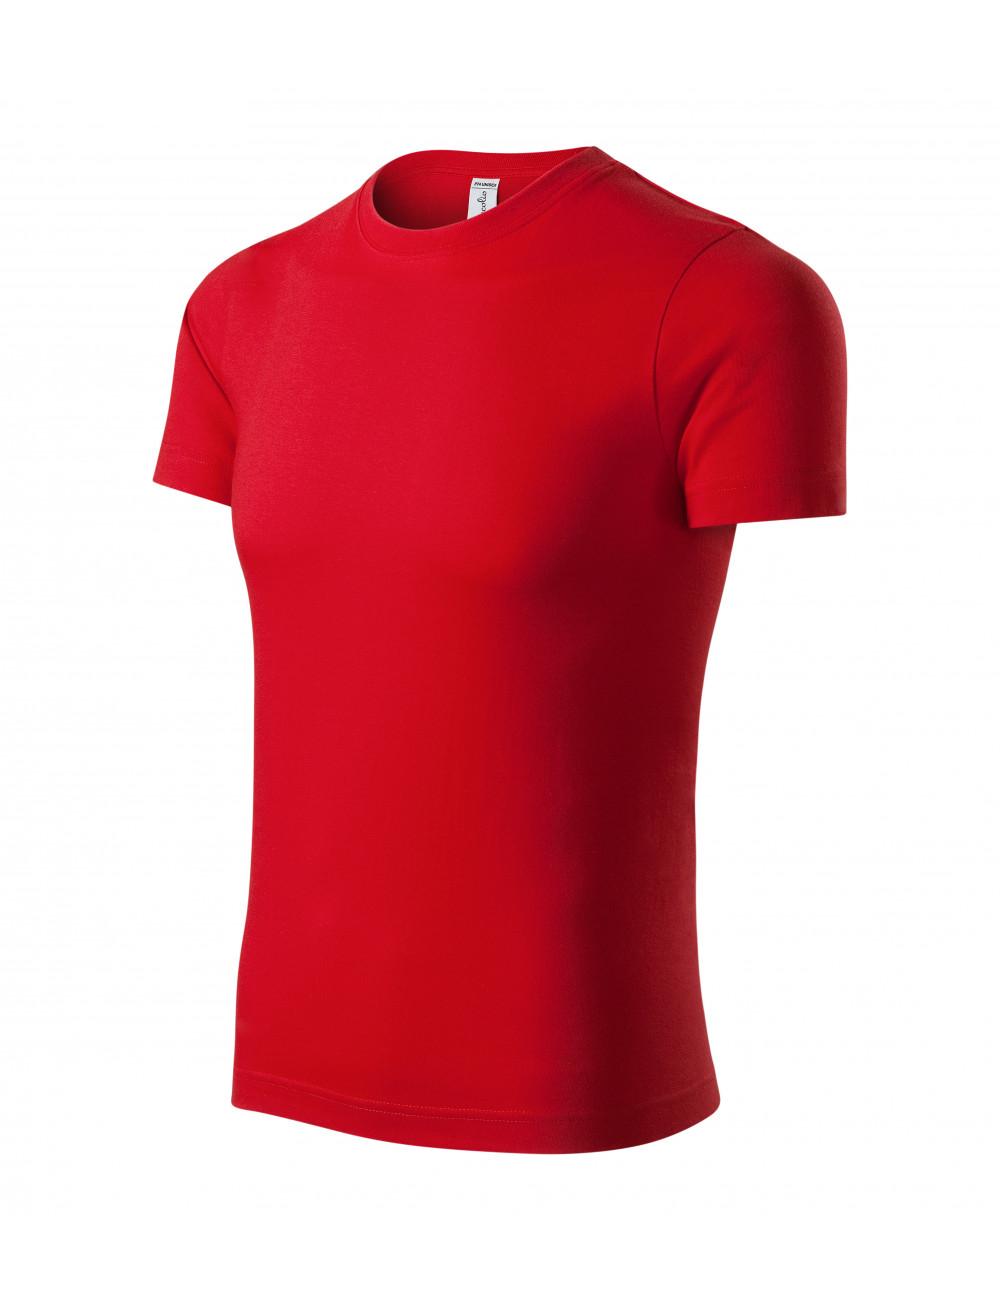 Adler PICCOLIO Koszulka unisex Peak P74 czerwony